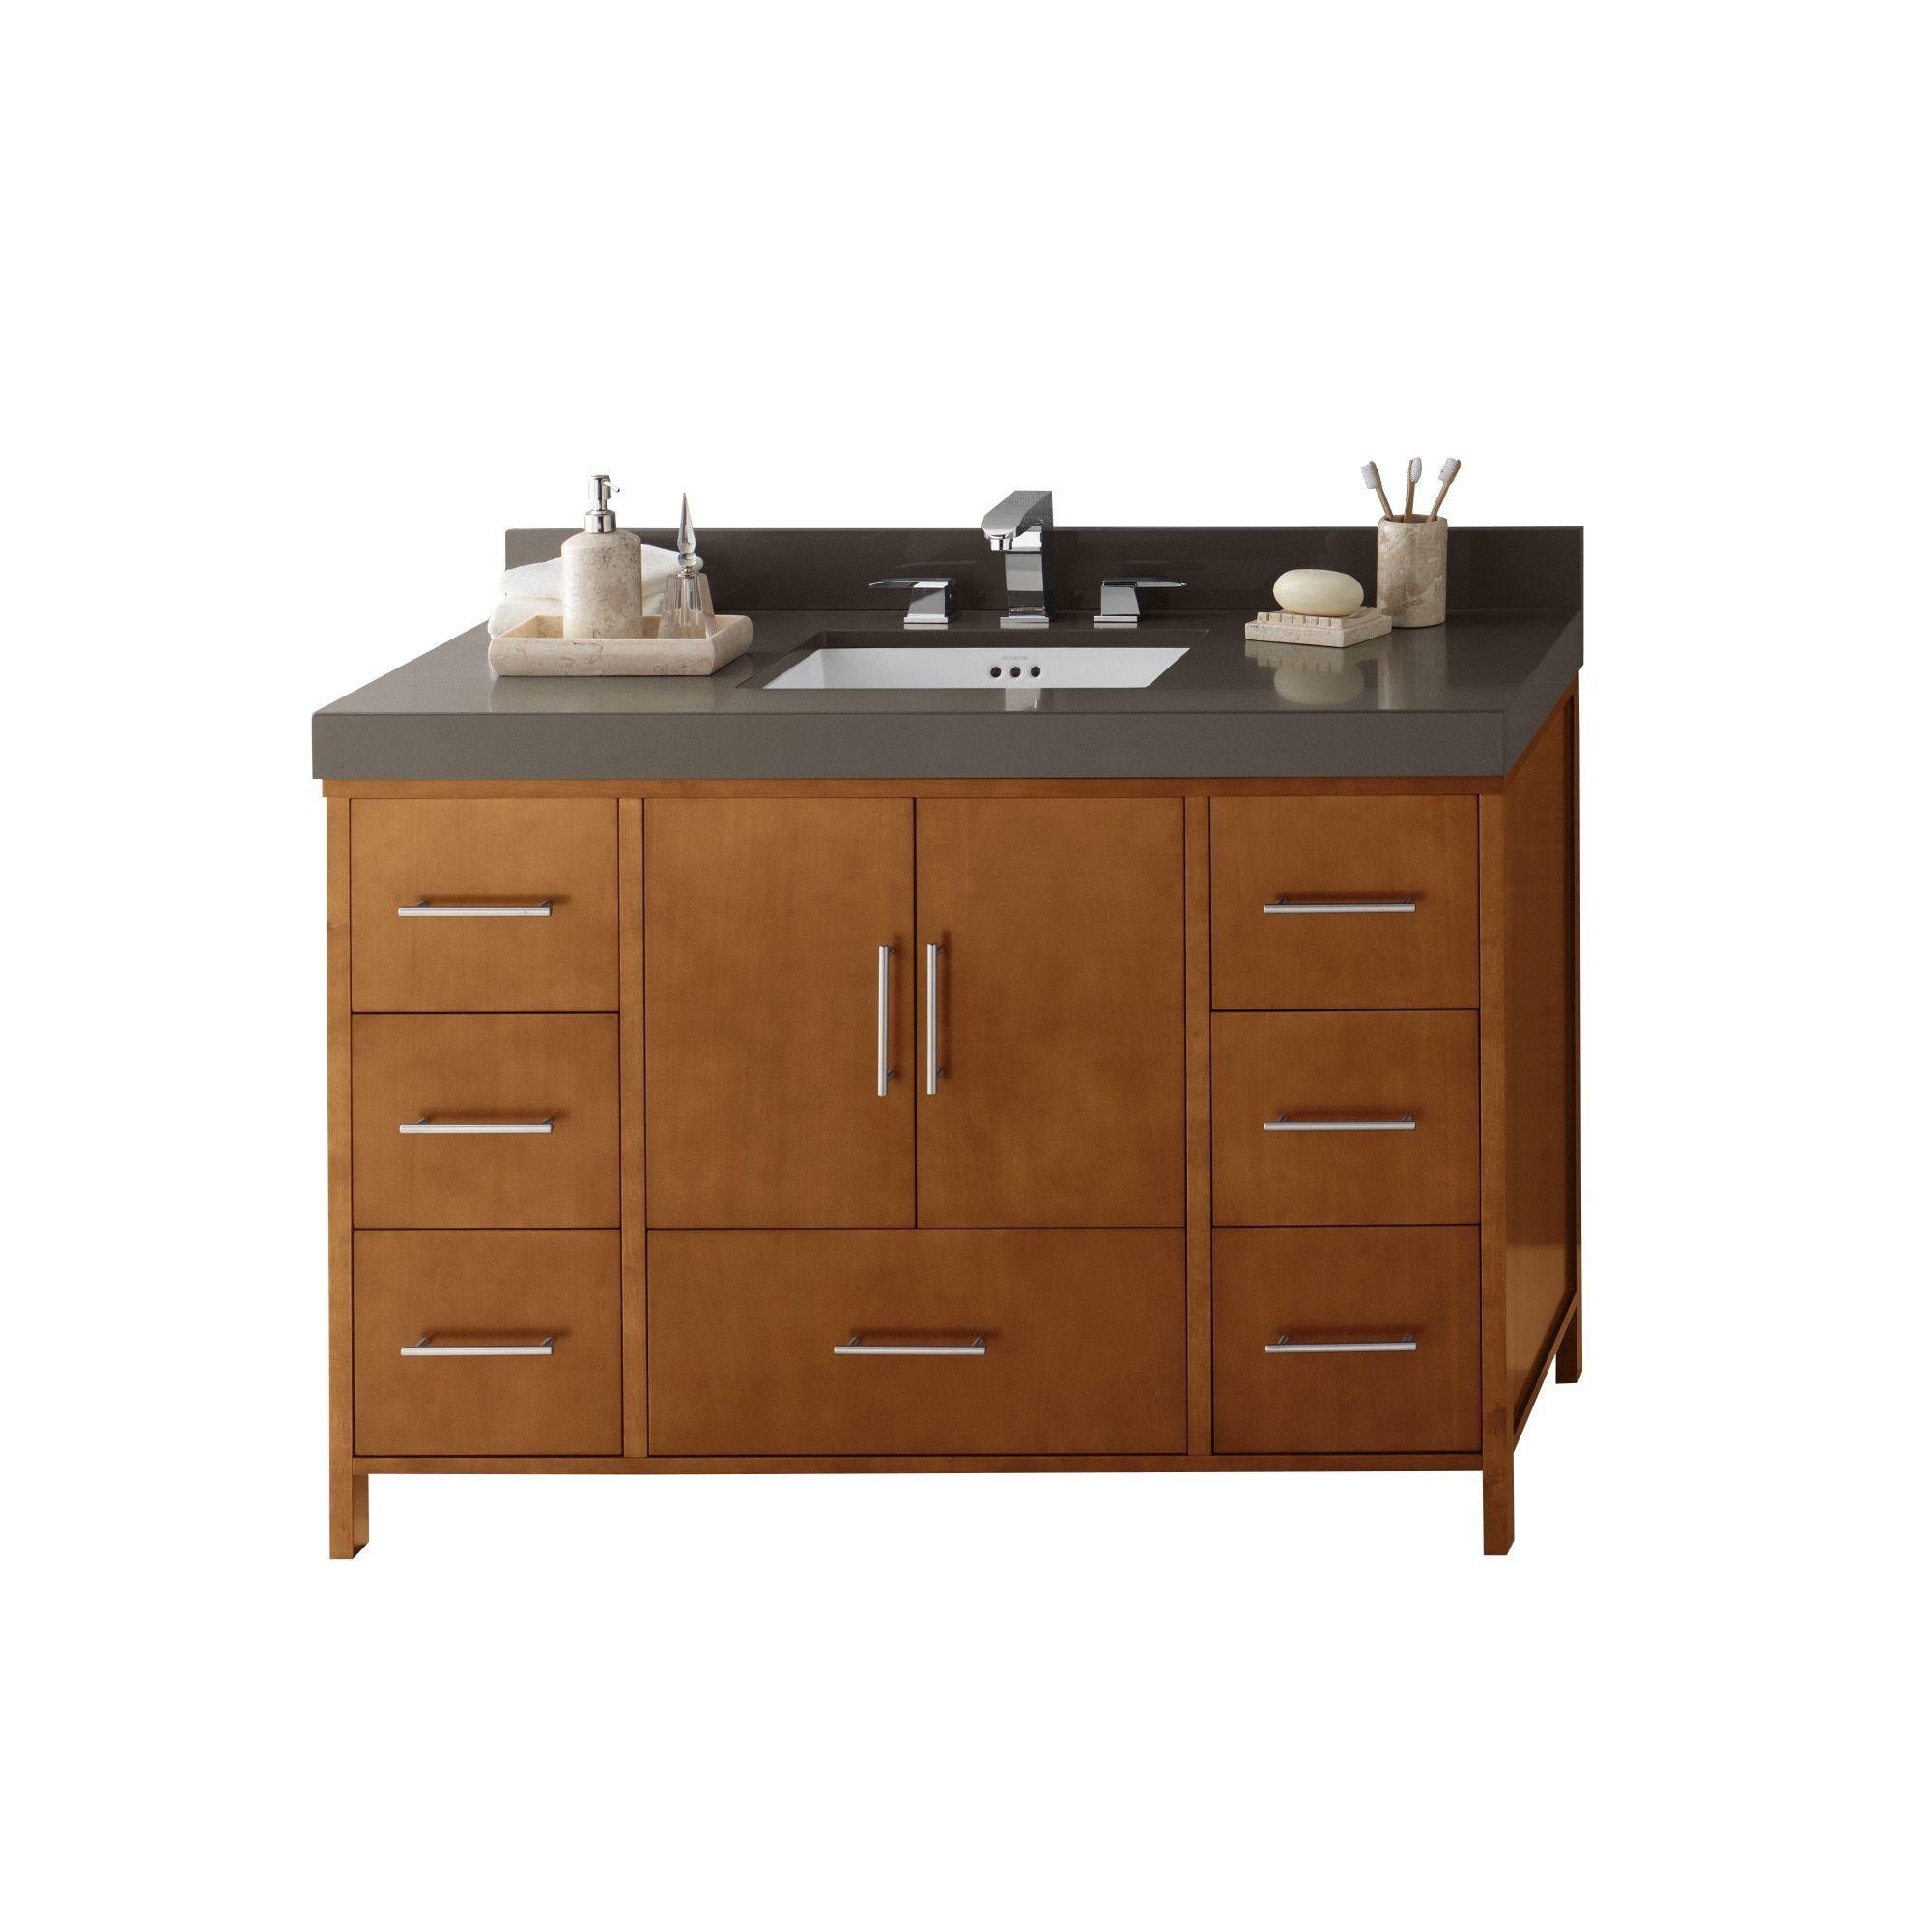 Ronbow Juno 48 Inch Bathroom Vanity Set In Cinnamon Quartz